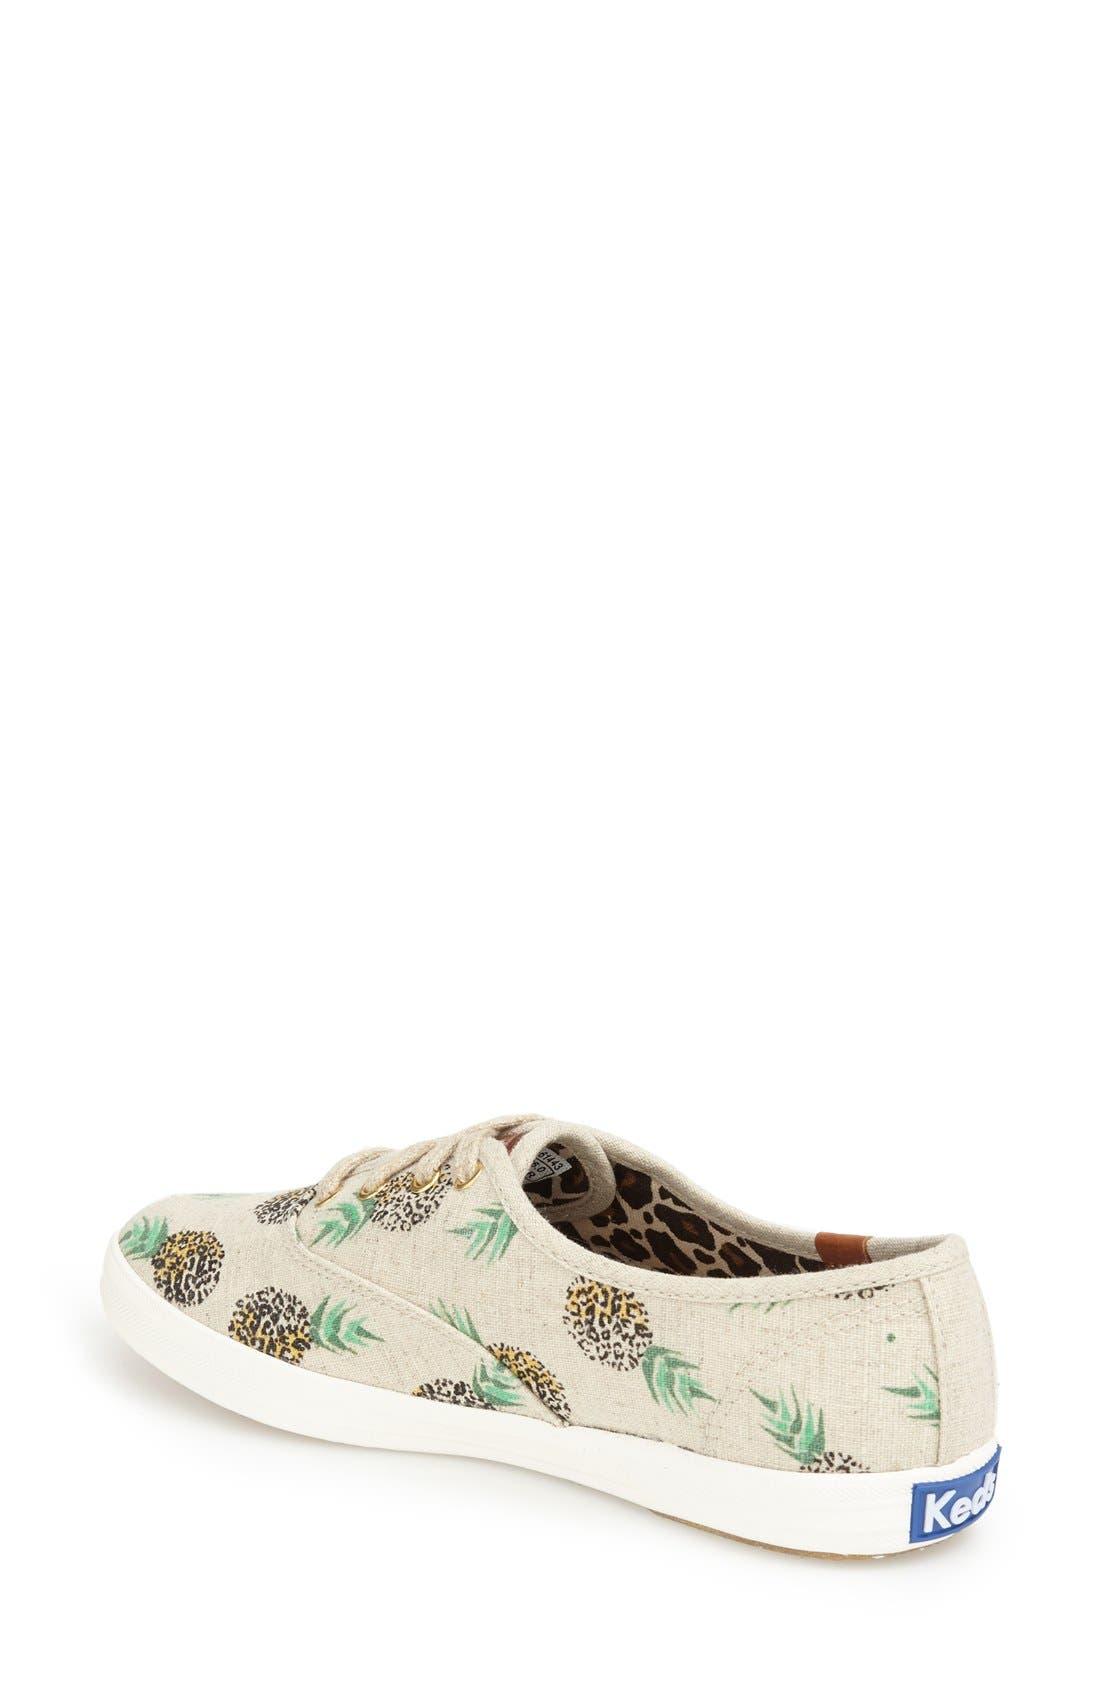 Alternate Image 2  - Keds® 'Champion' Print Sneaker (Women)